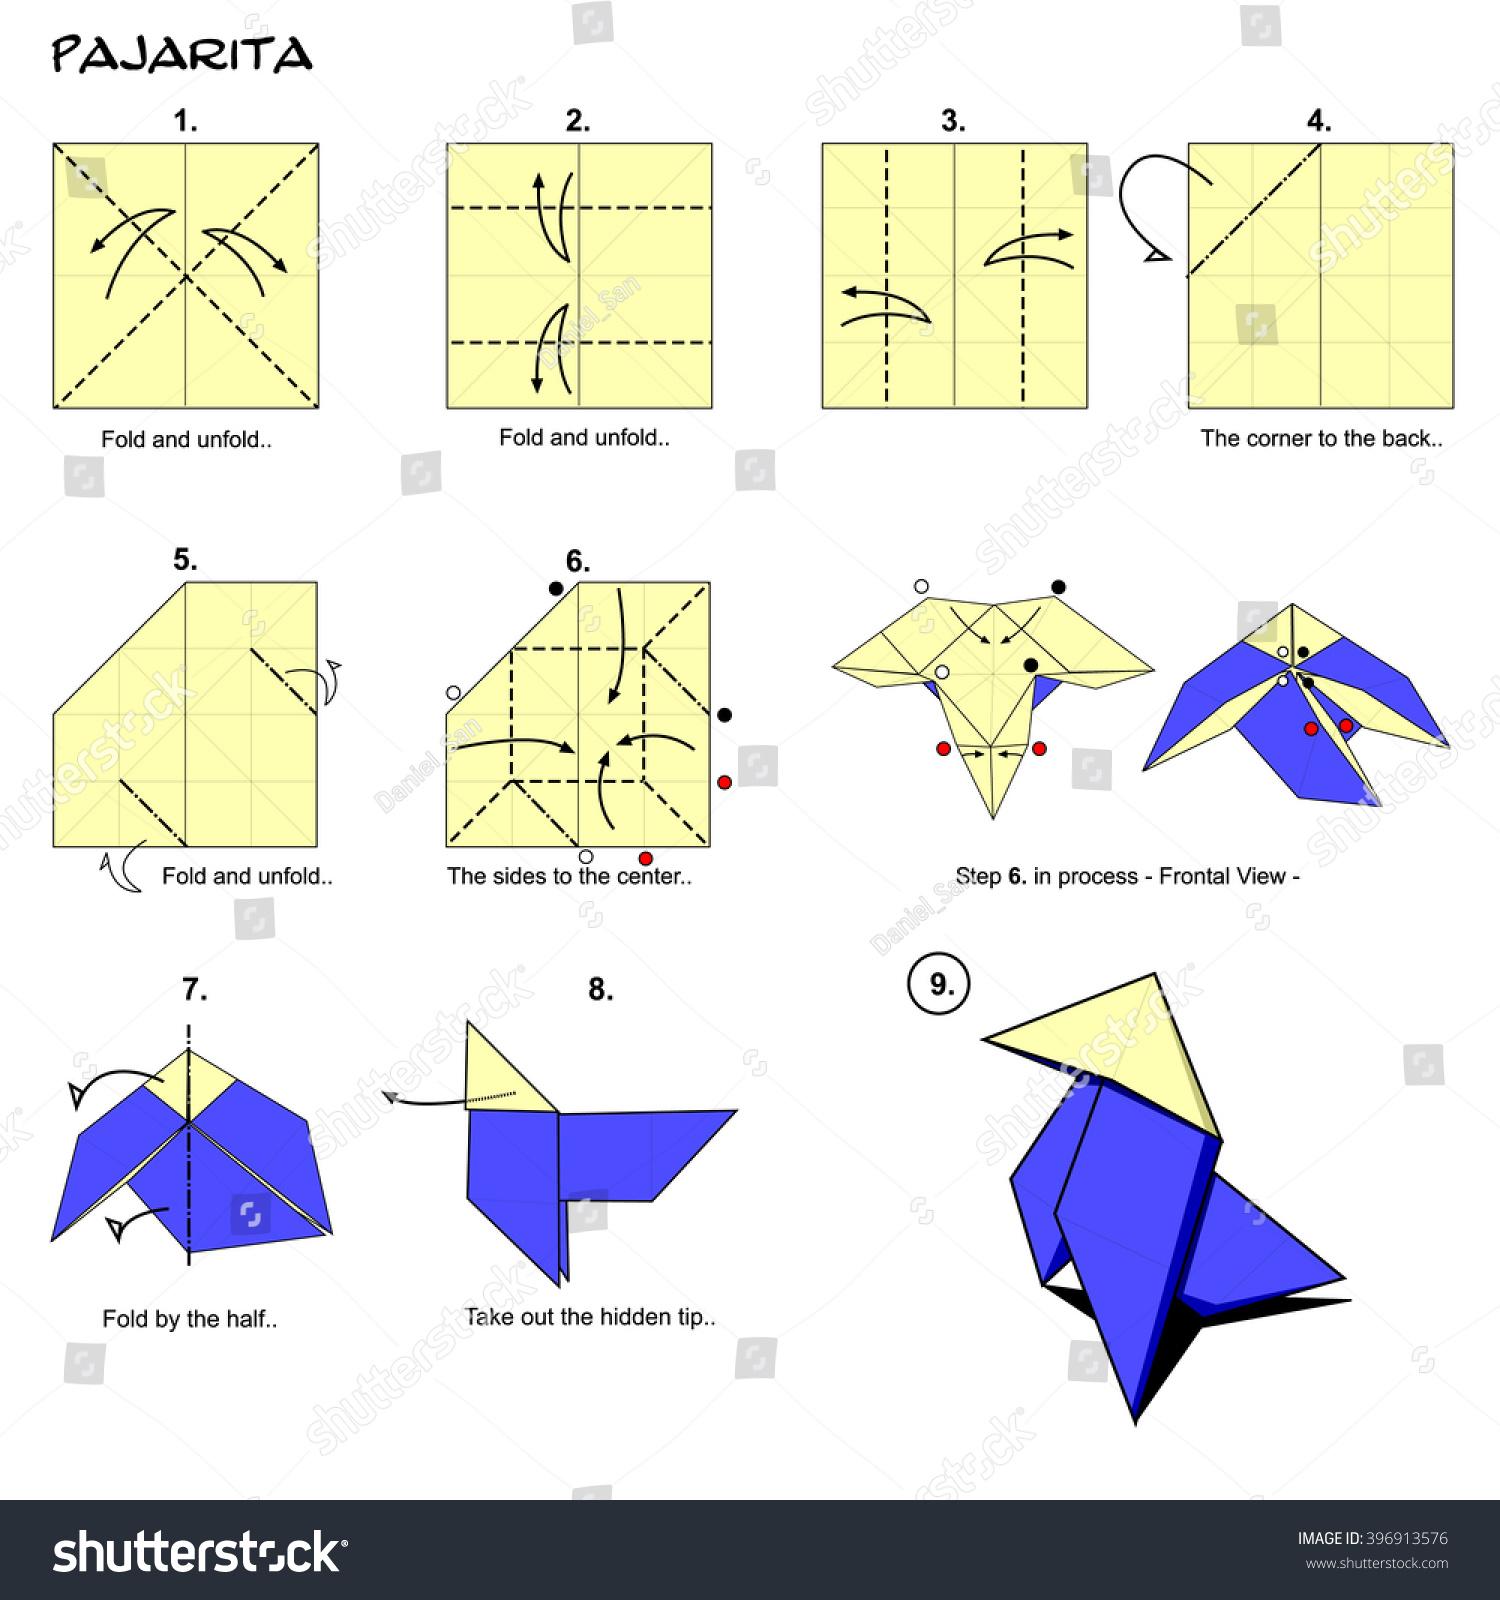 Origami process choice image craft decoration ideas origami traditional bird spanish pajarita diagram stock illustration origami traditional bird spanish pajarita diagram instructions step thecheapjerseys Image collections